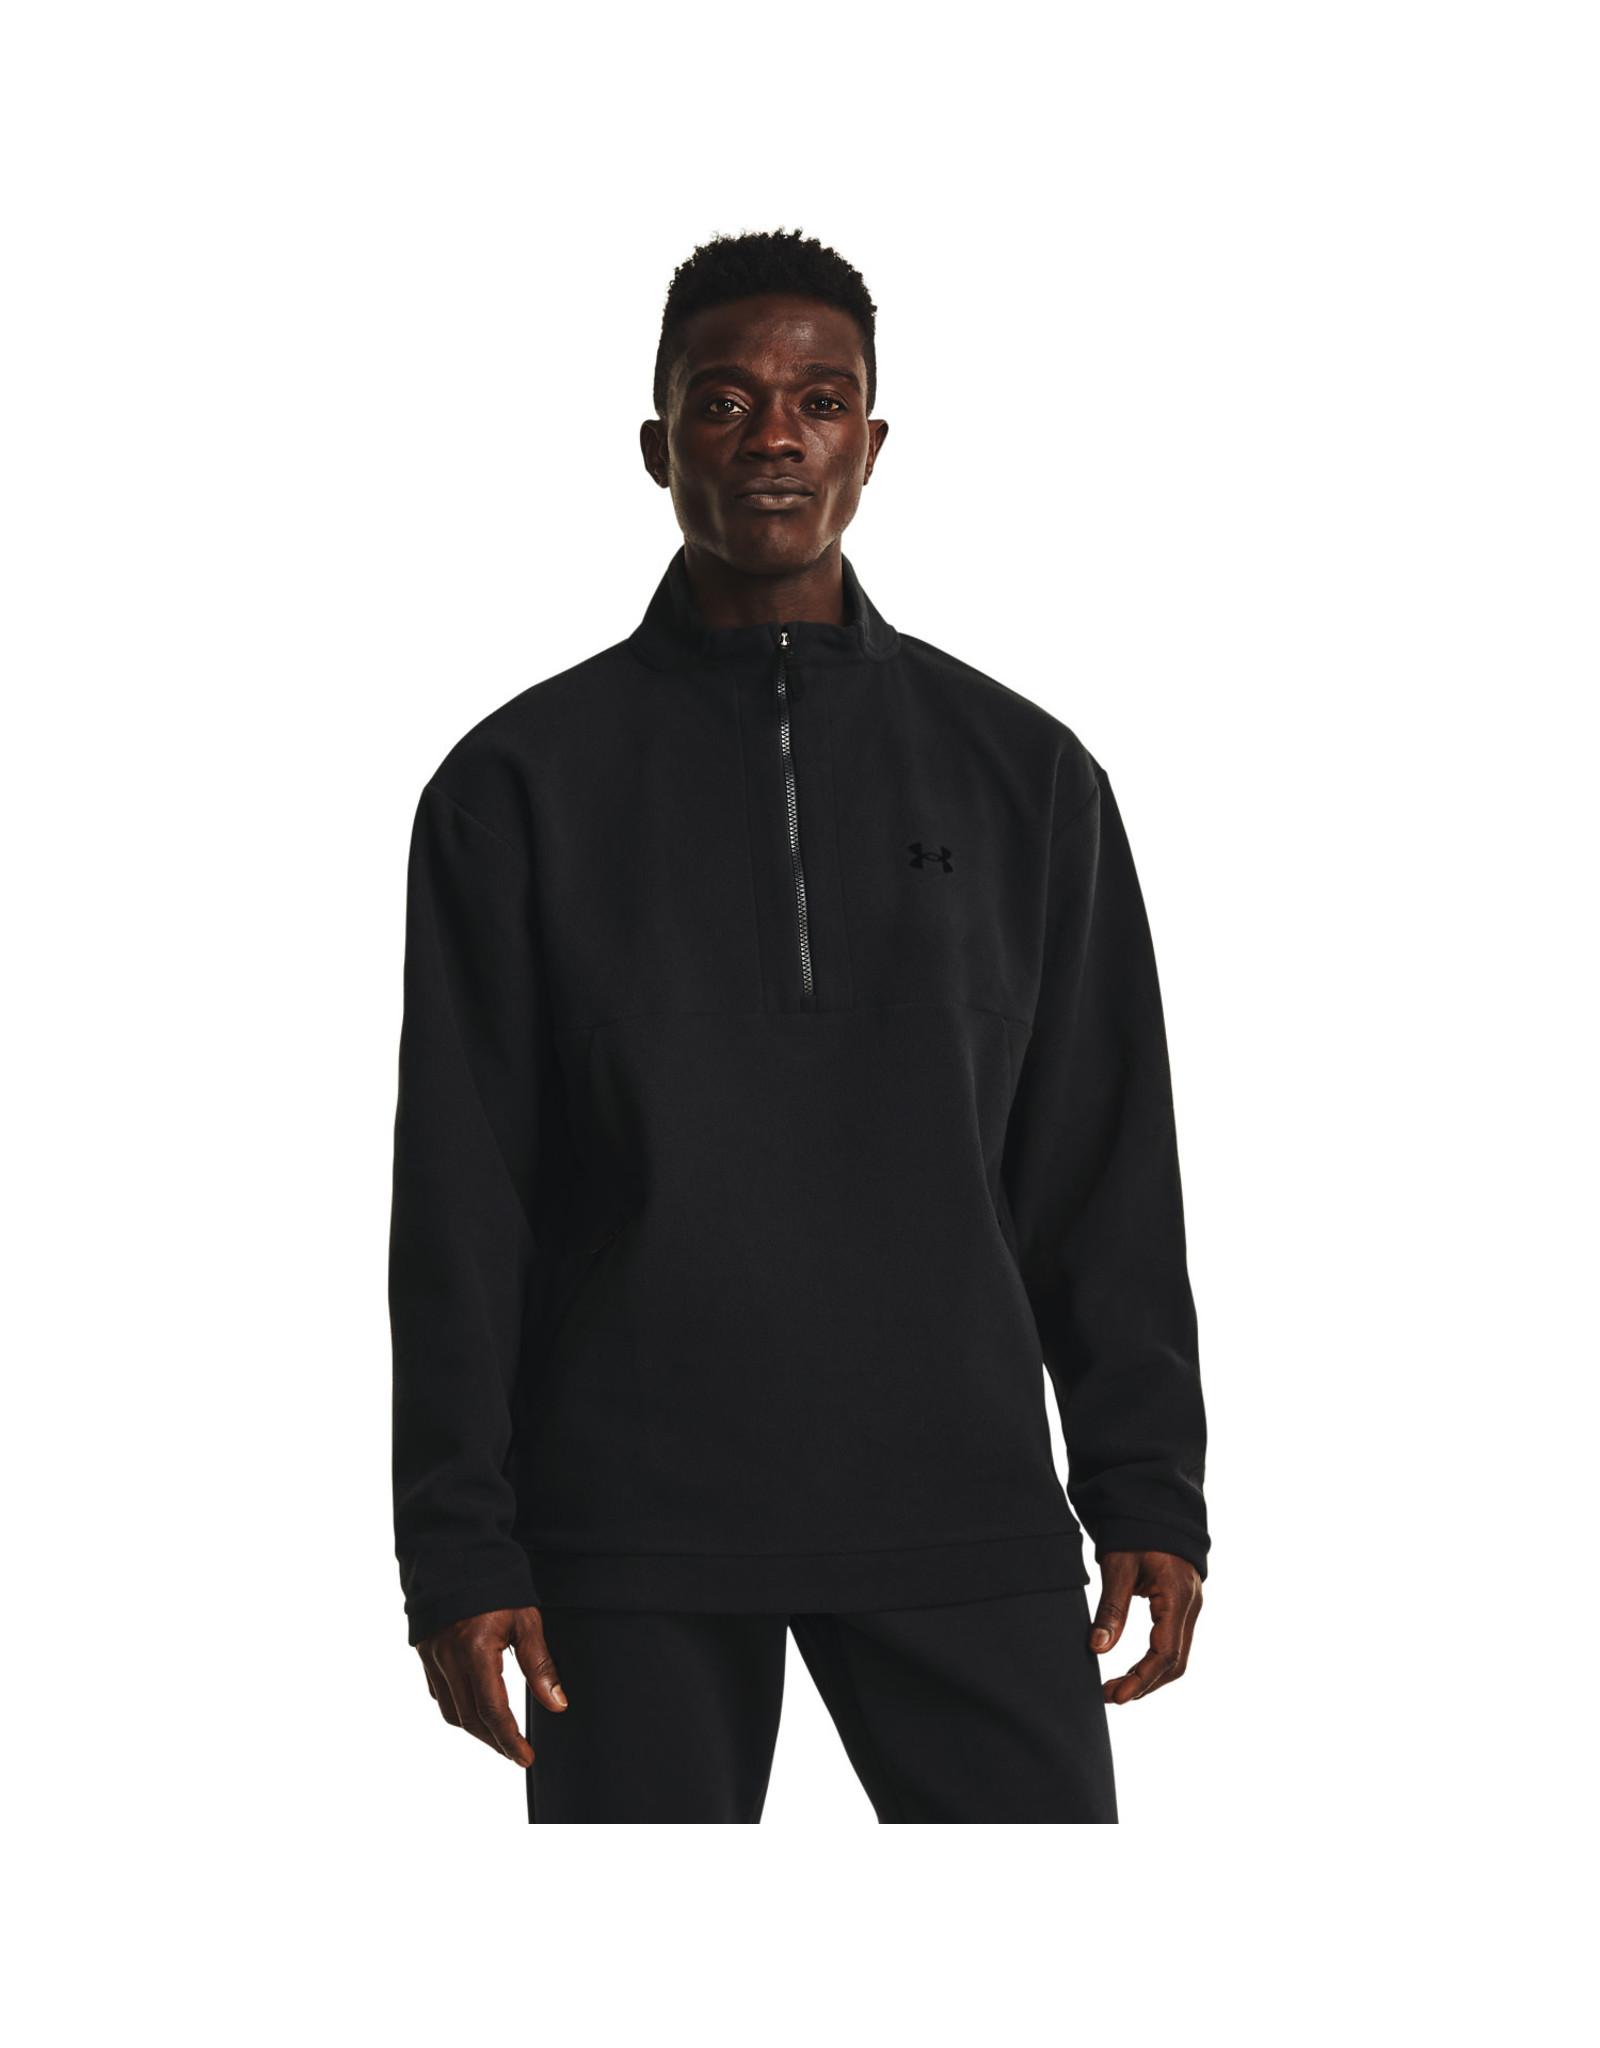 Under Armour UA RECOVER Fleece ¼ Zip - Black-Black-Black